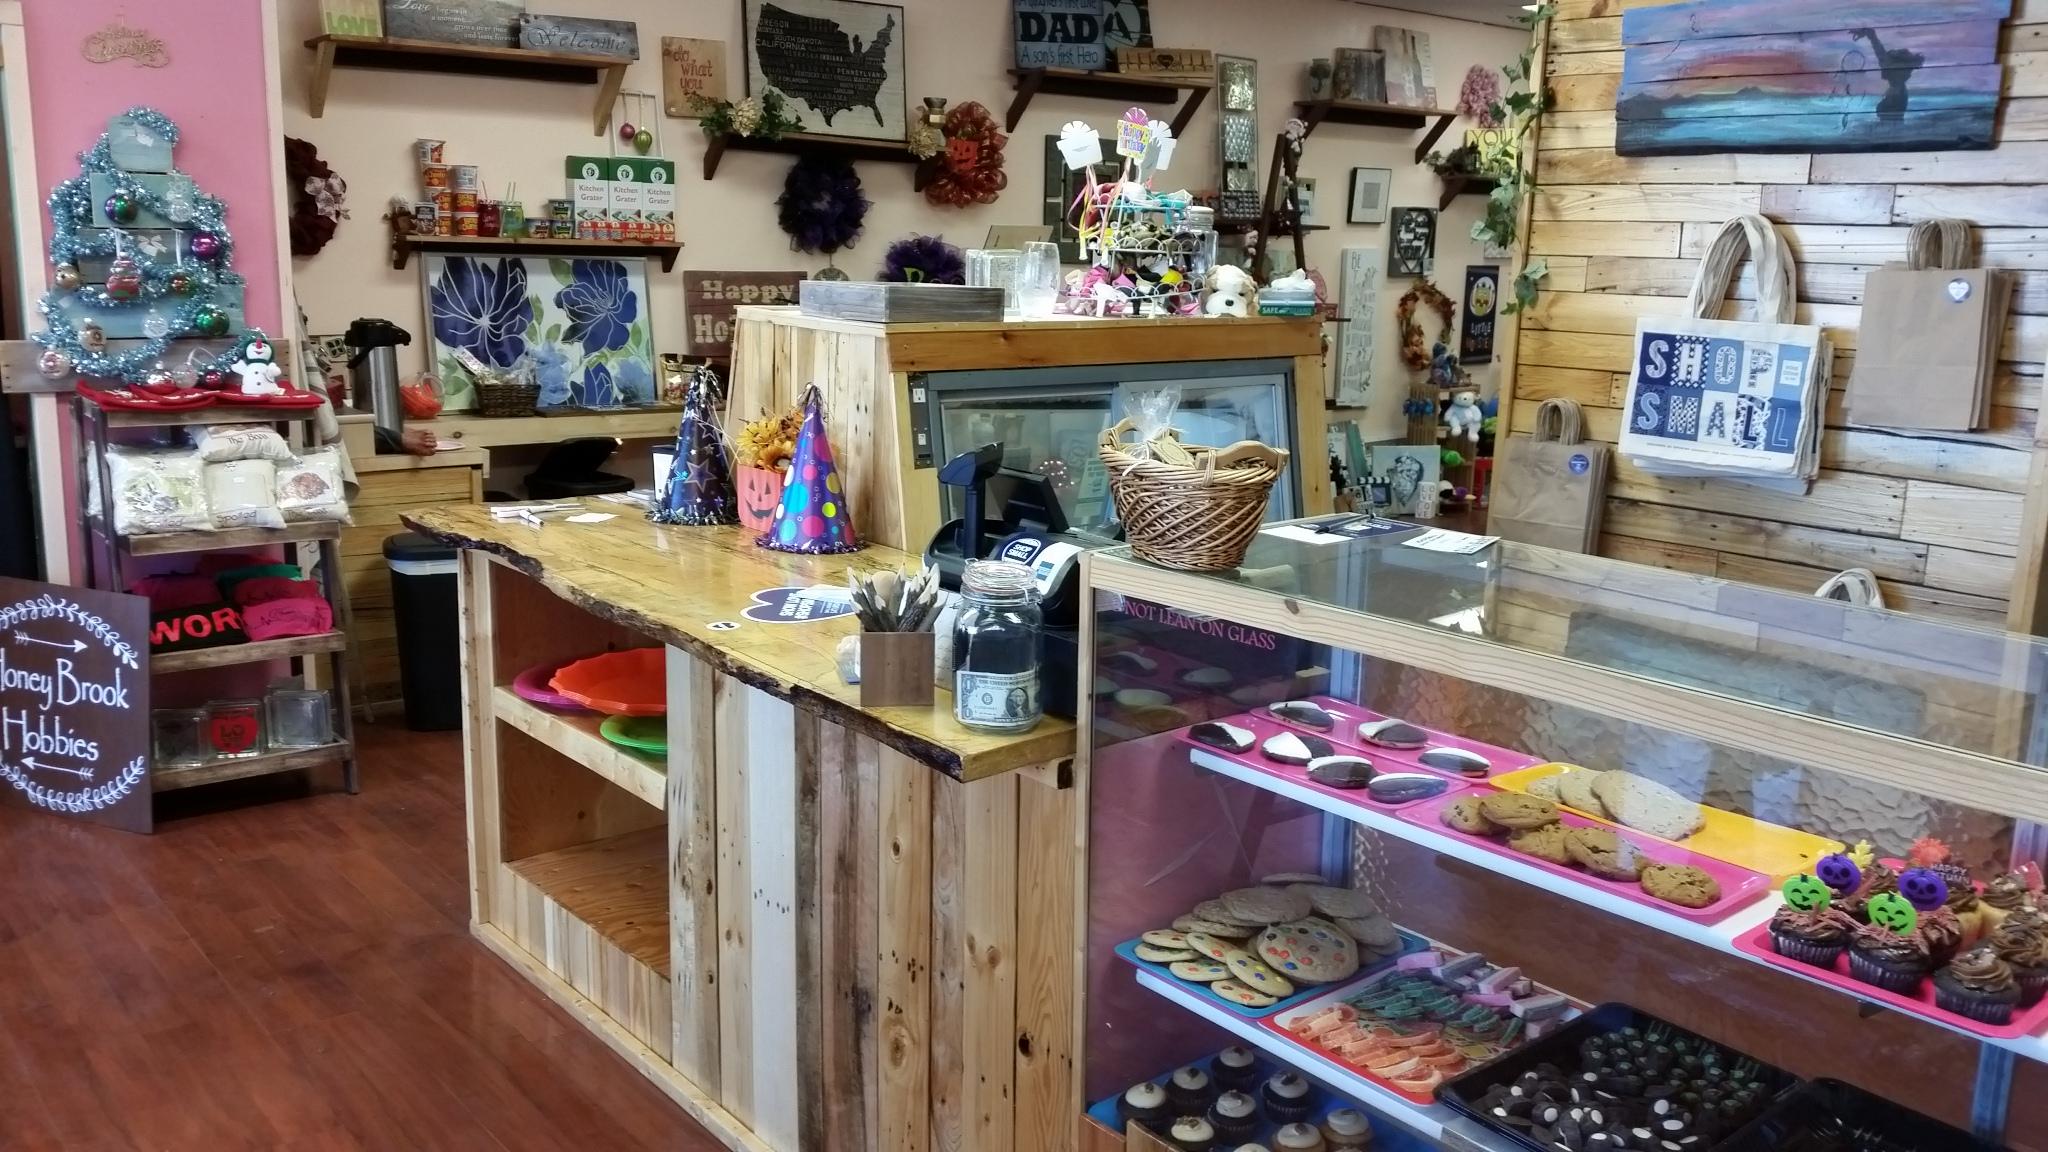 Honey Brook Hobbies Bakery & Gift